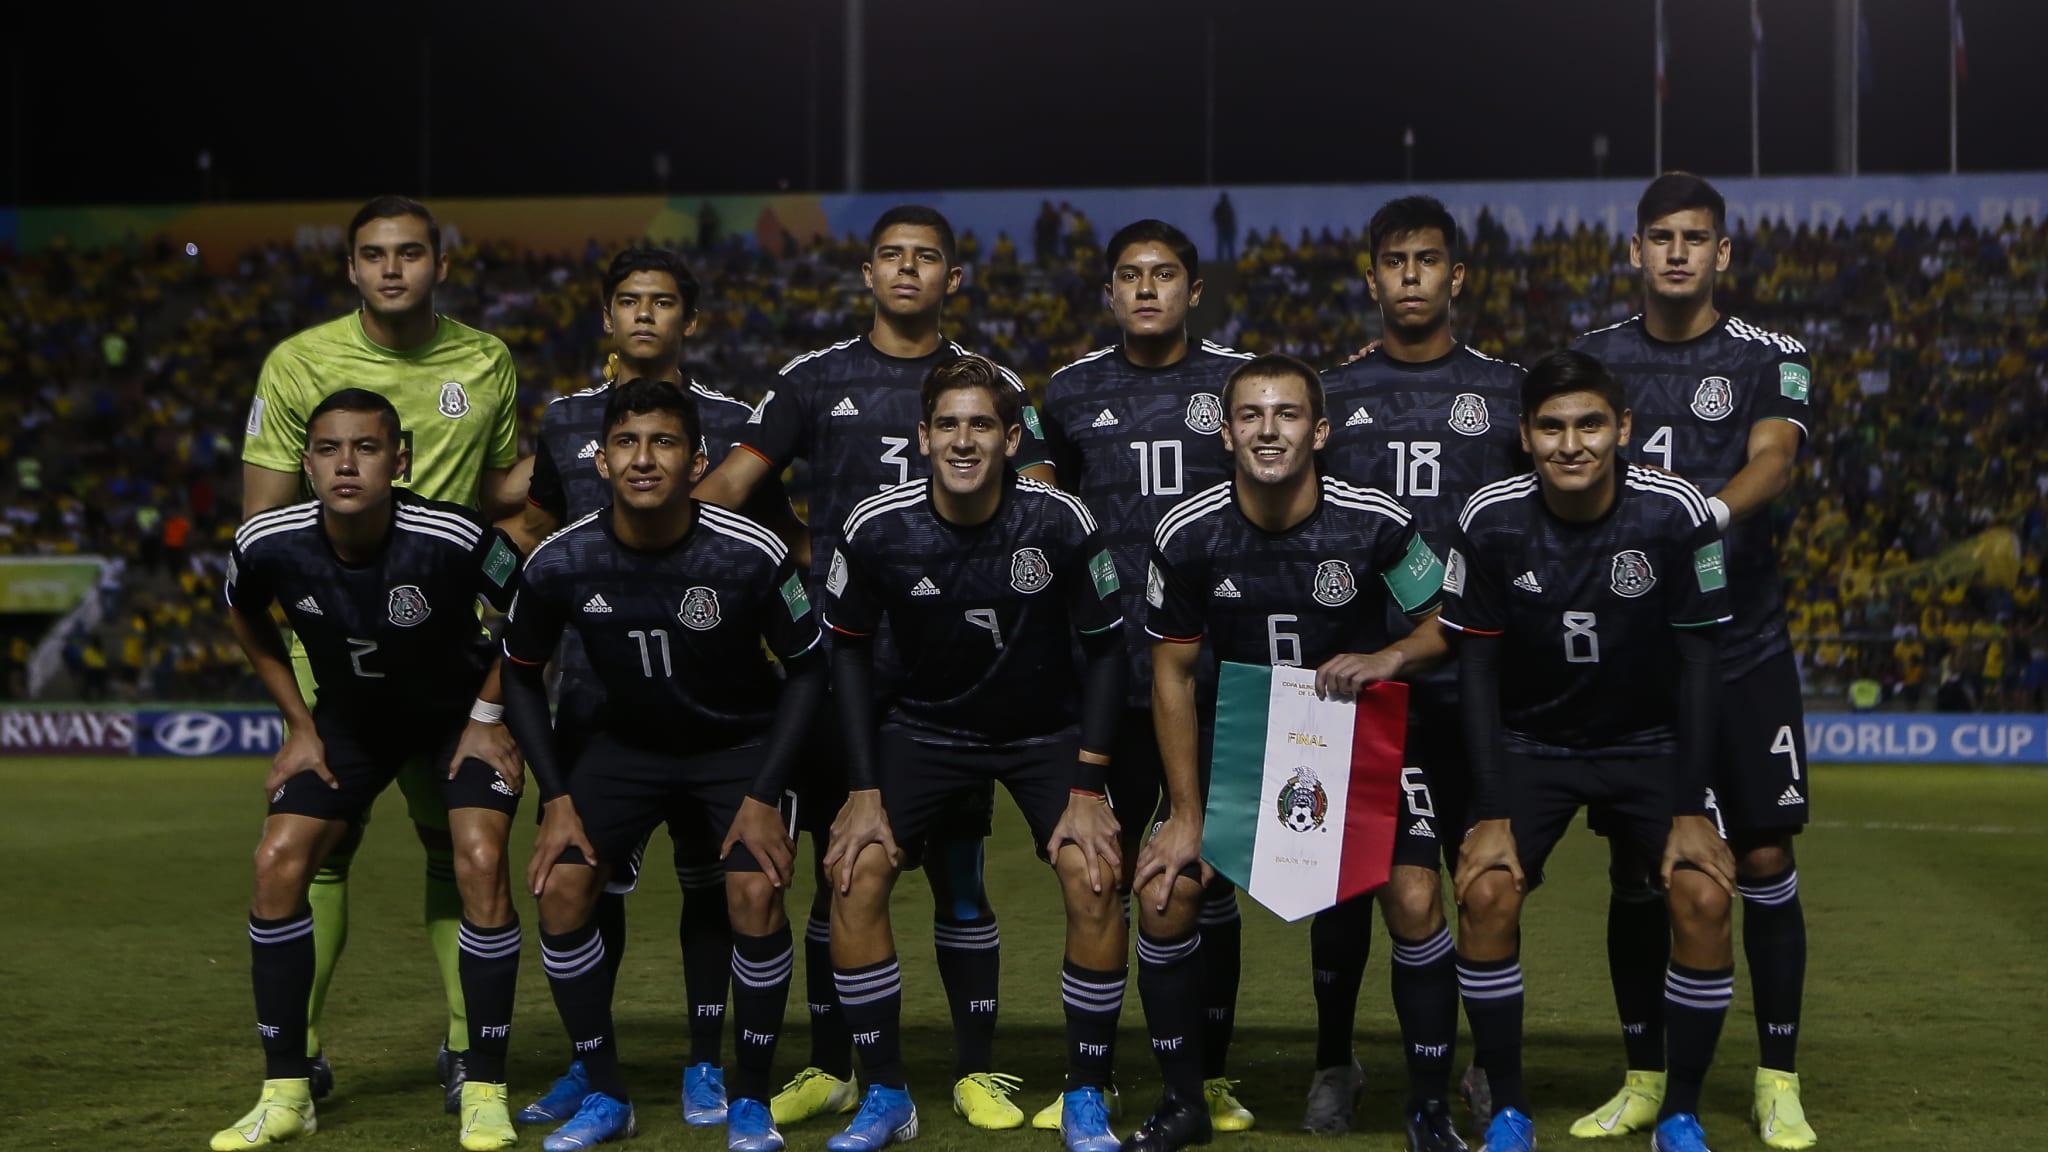 Mexico v Brazil - FIFA U-17 World Cup Brazil 2019 Final